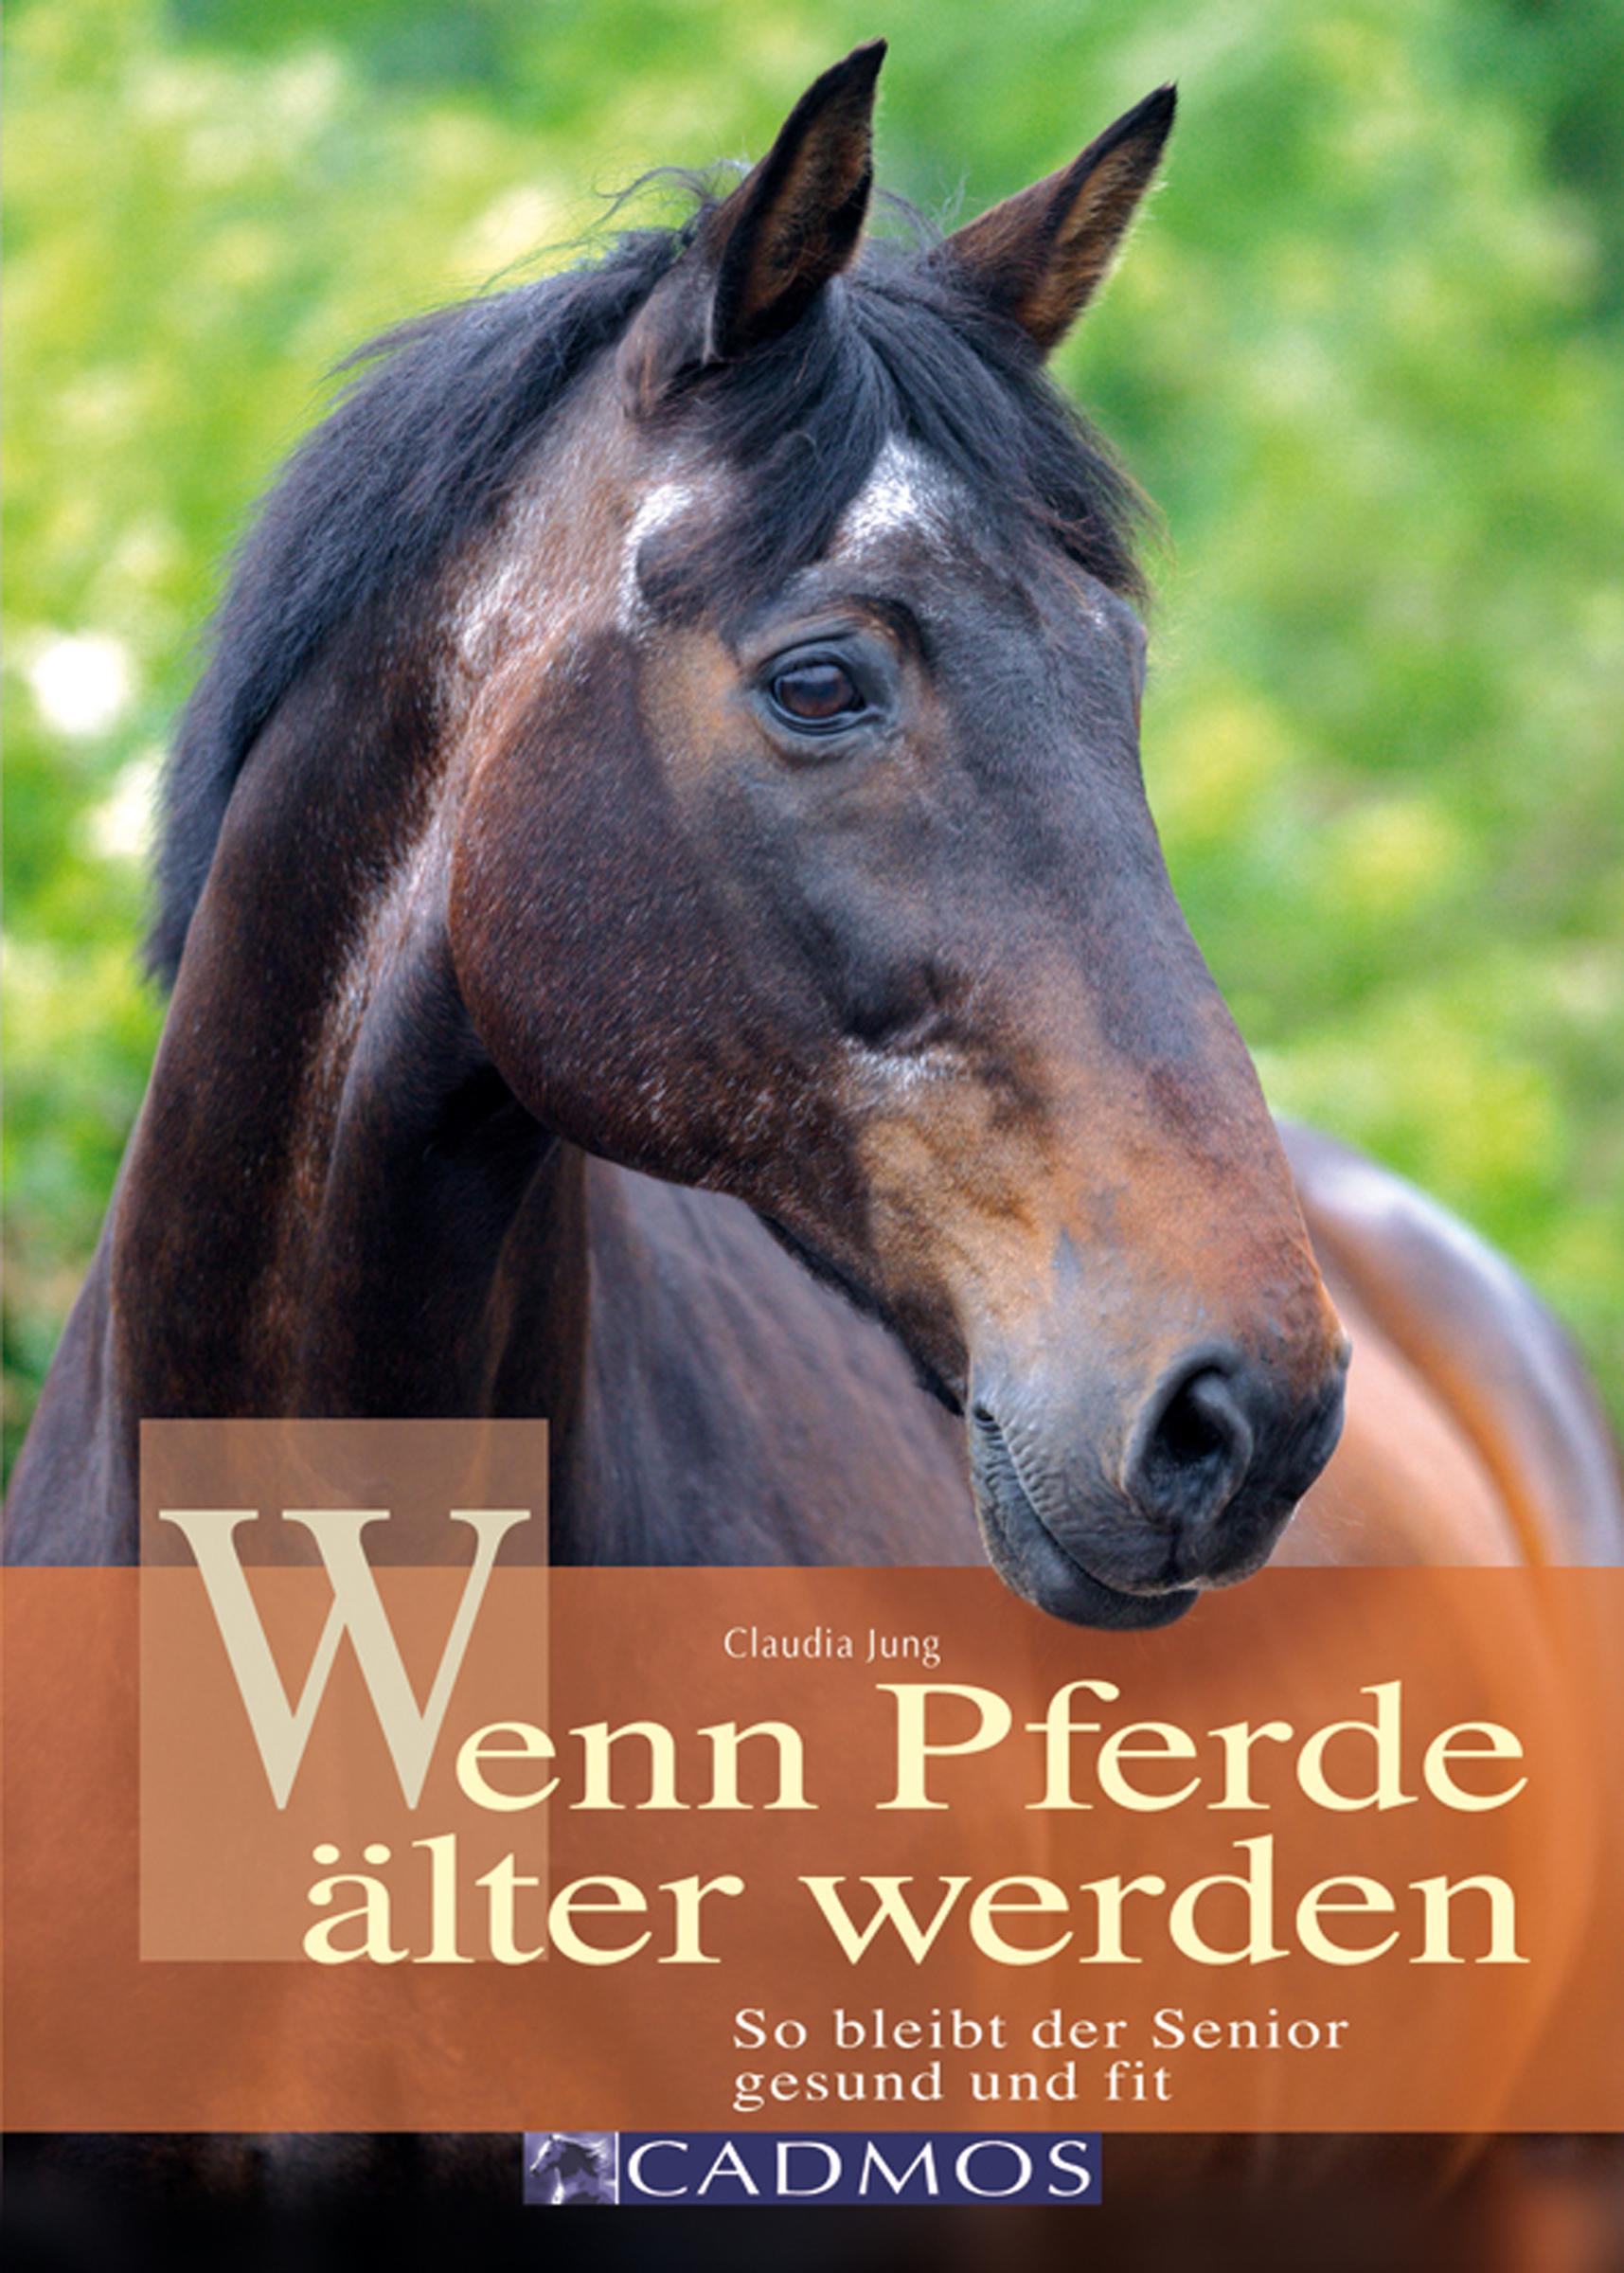 Claudia Jung Wenn Pferde älter werden